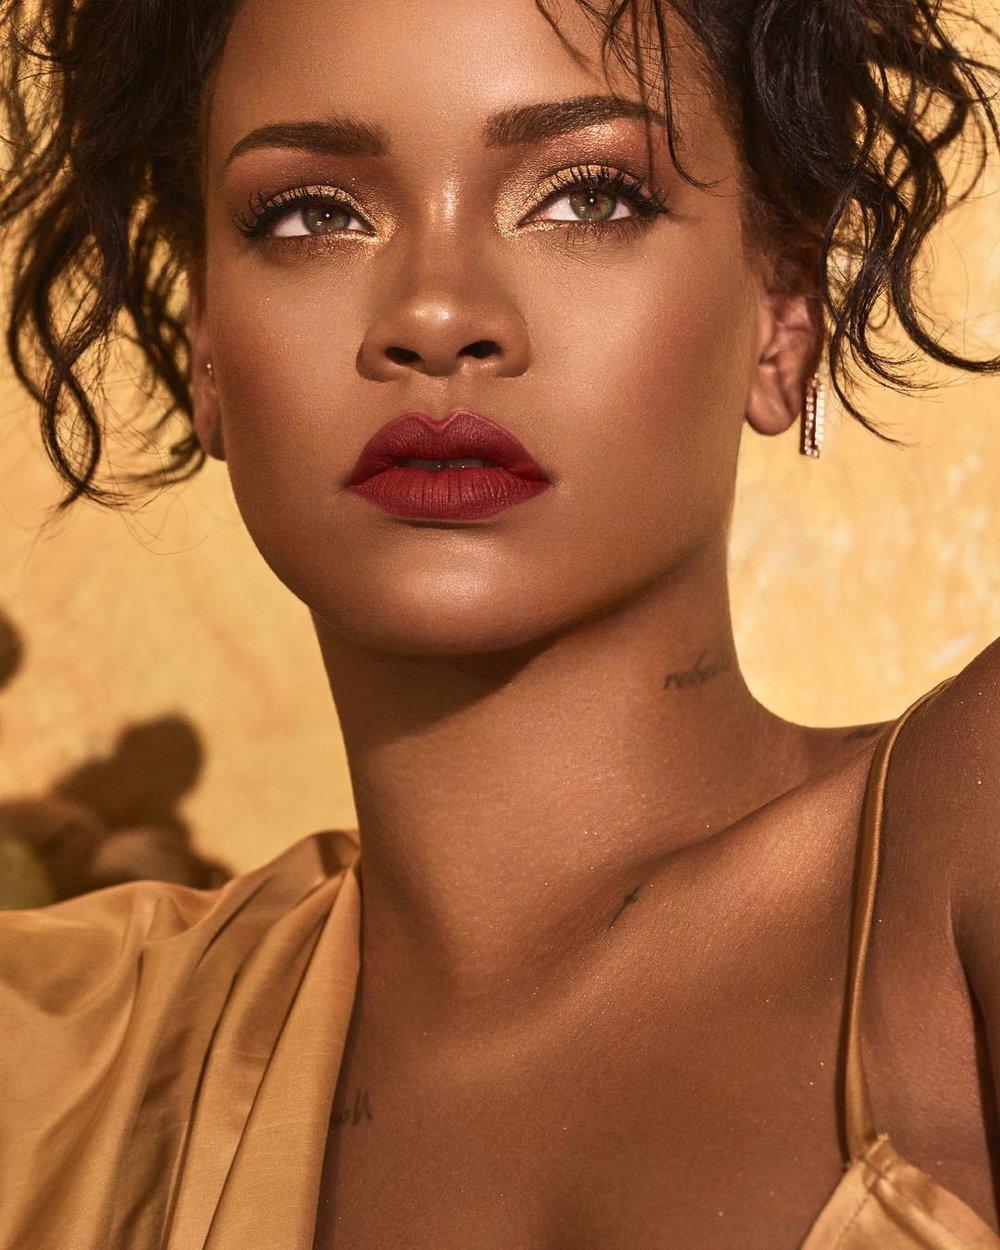 Rihanna: 64.5 Million Followers